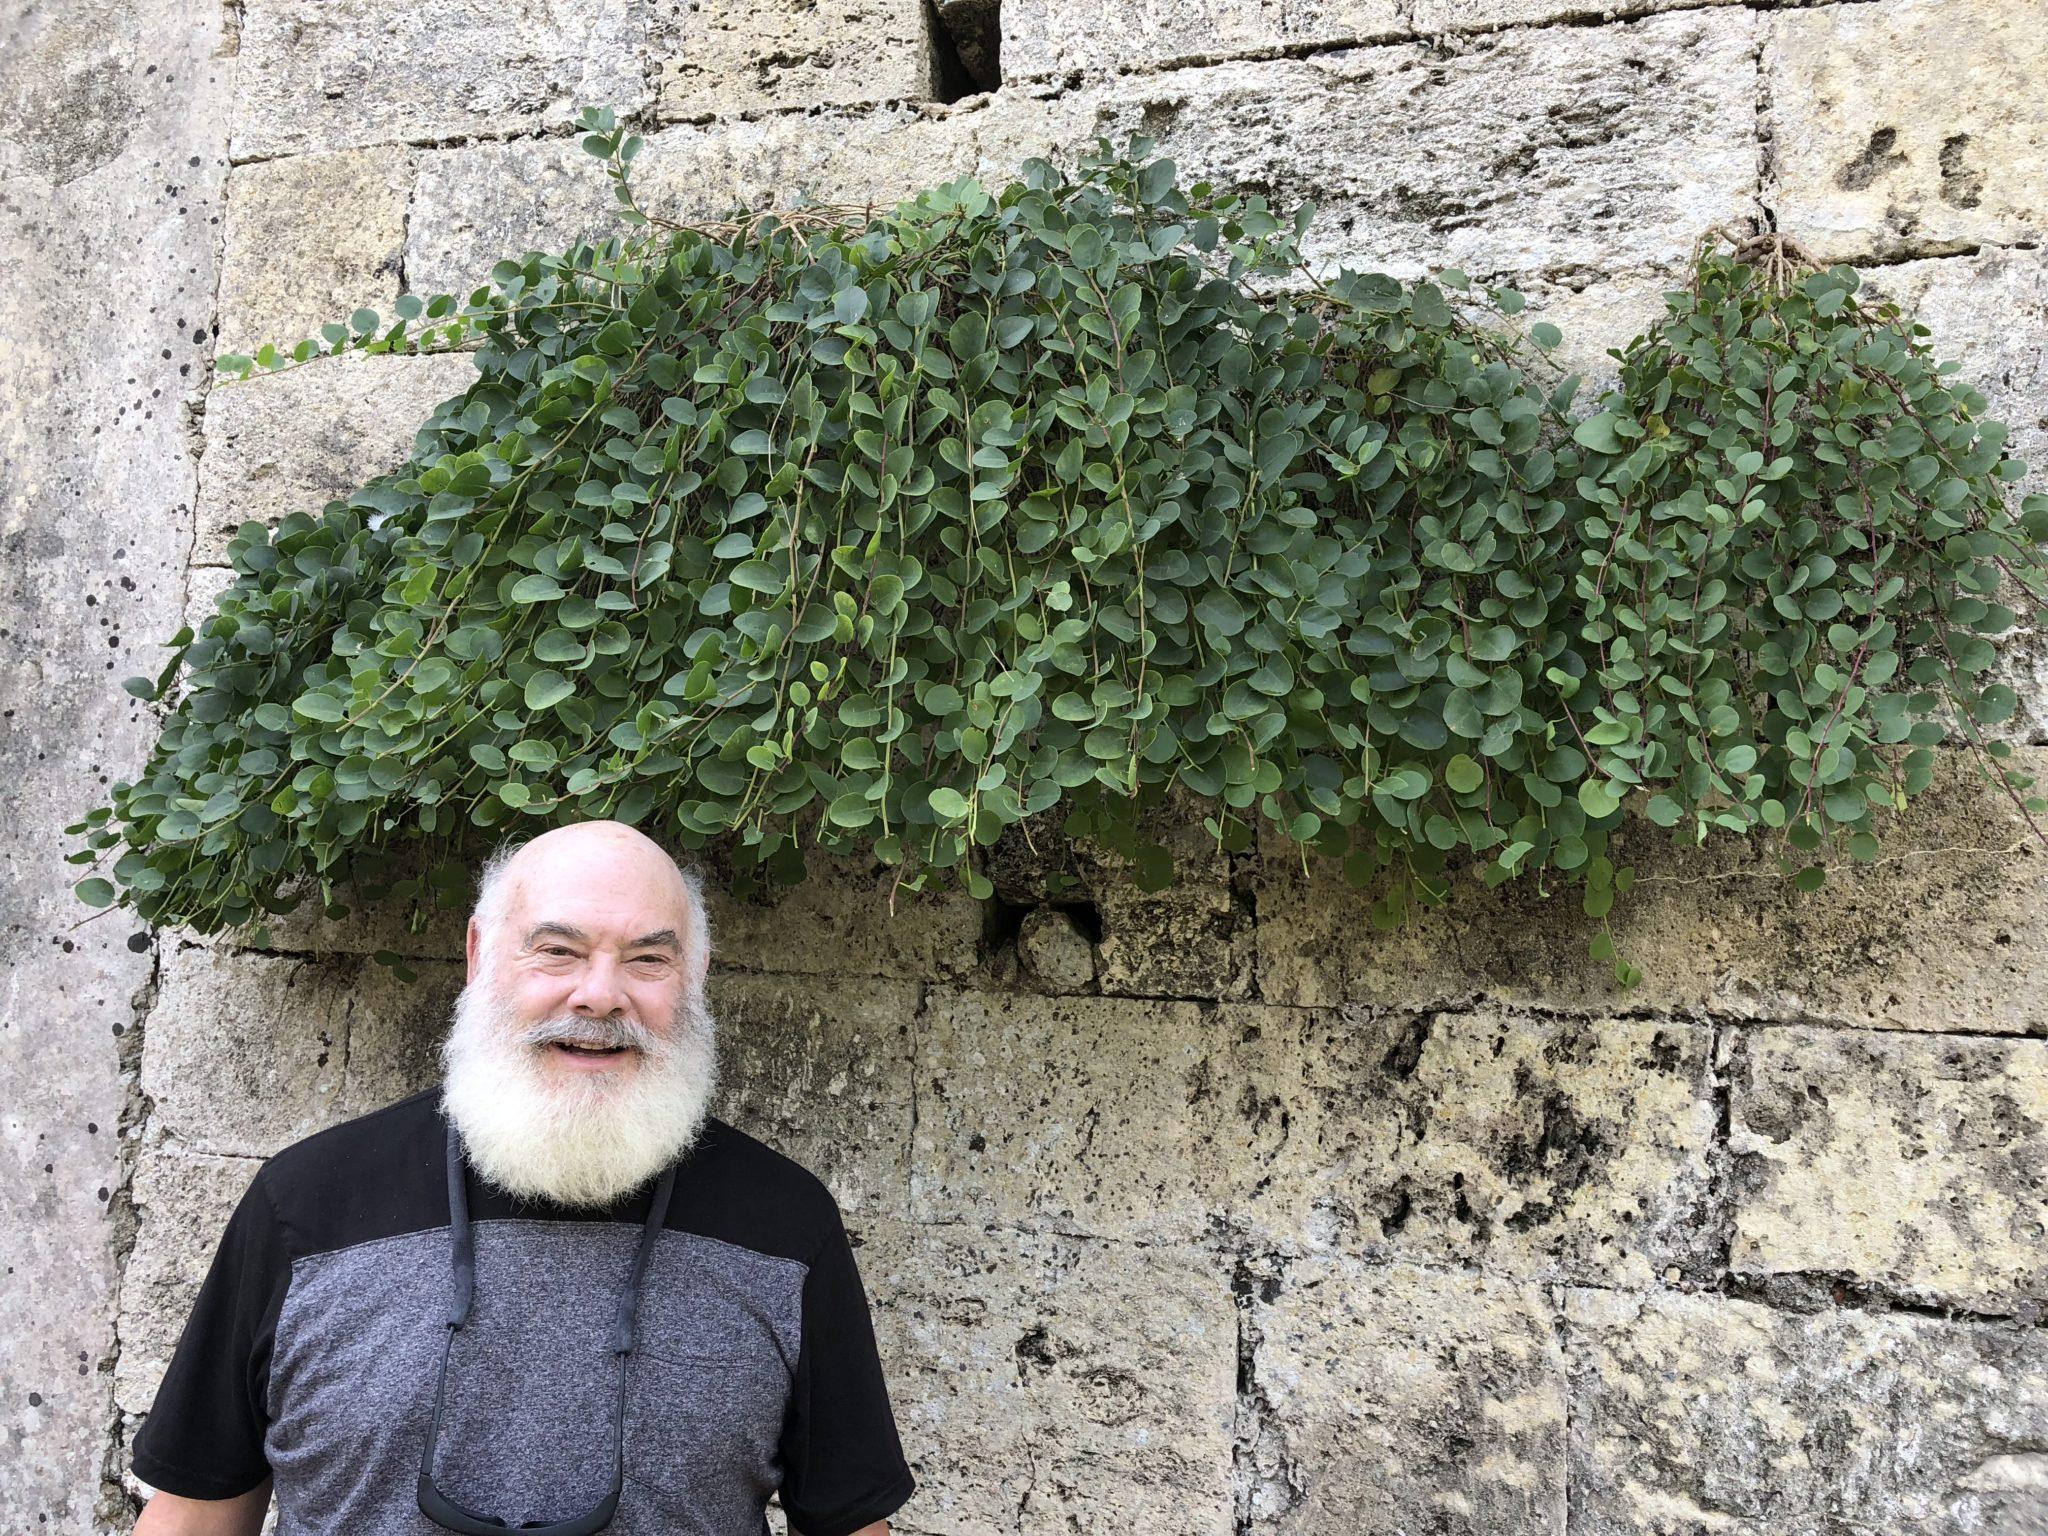 25 AW caper plant stone wall syracuse siscily_20181012_4195